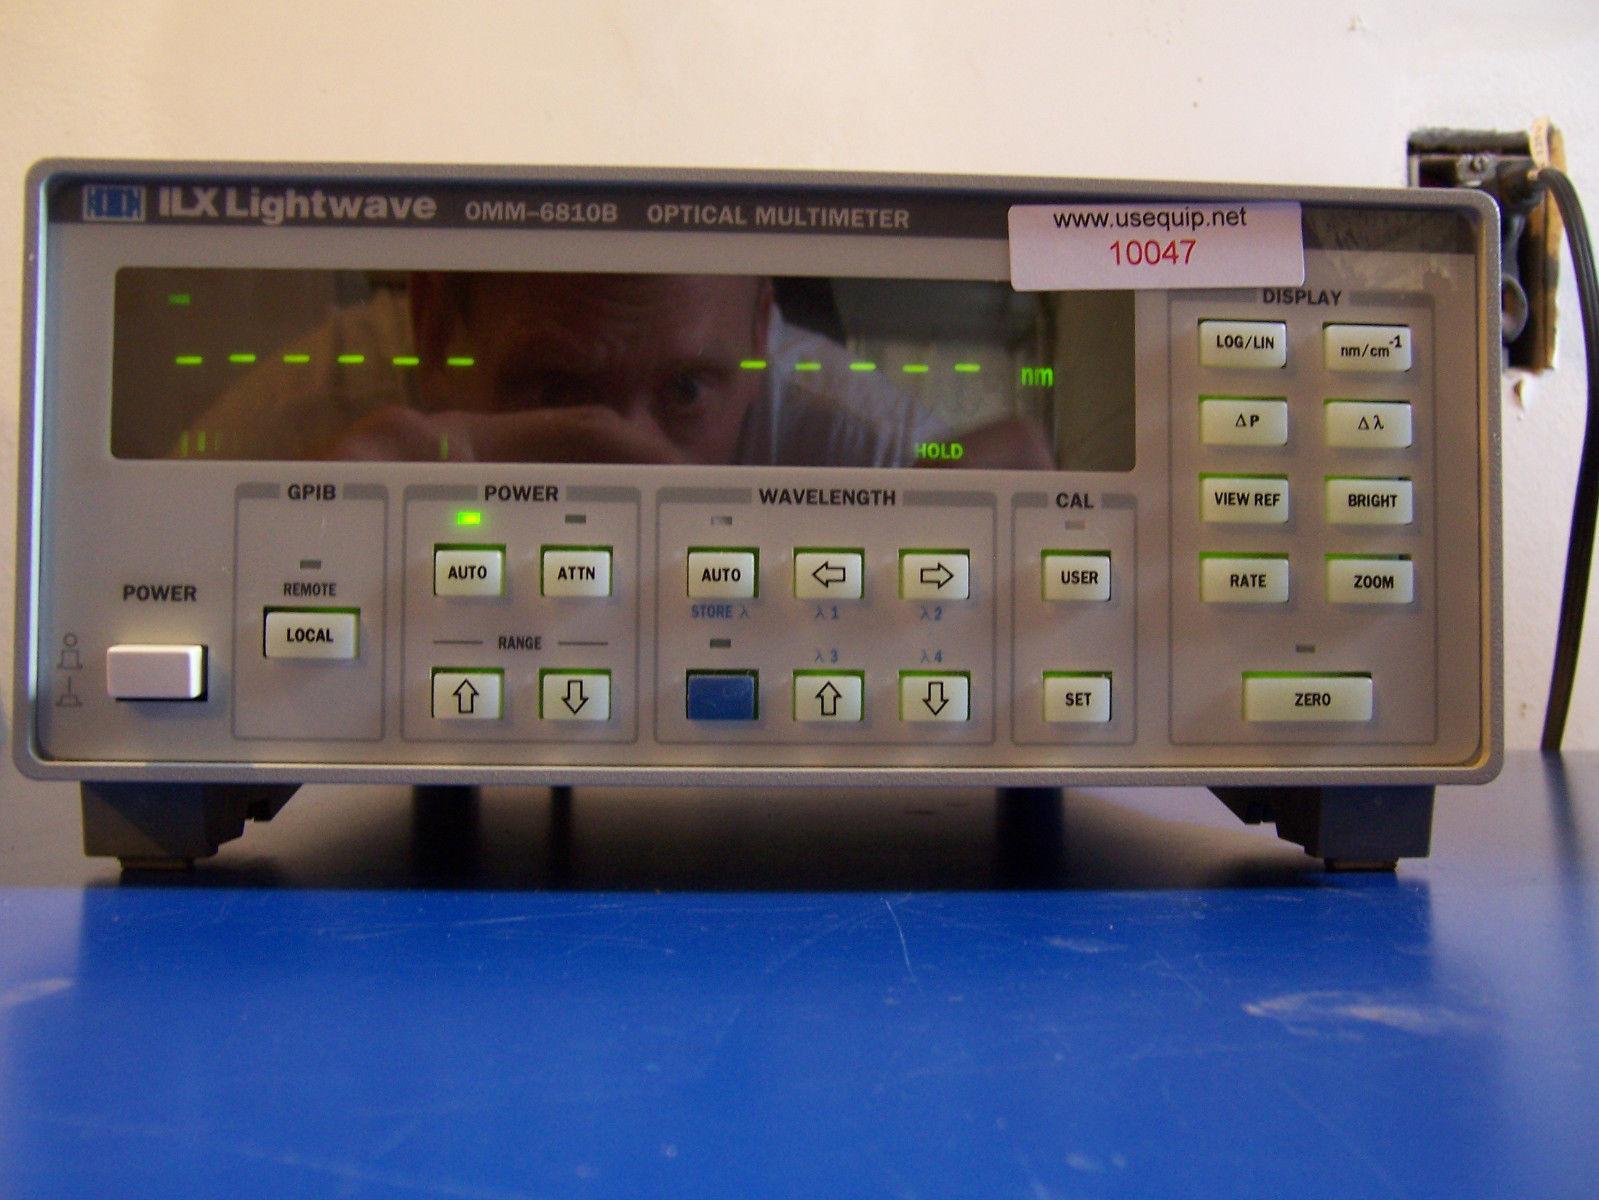 10047 ILX LIGHTWAVE OMM-6810B OPTICAL MULTIMETER